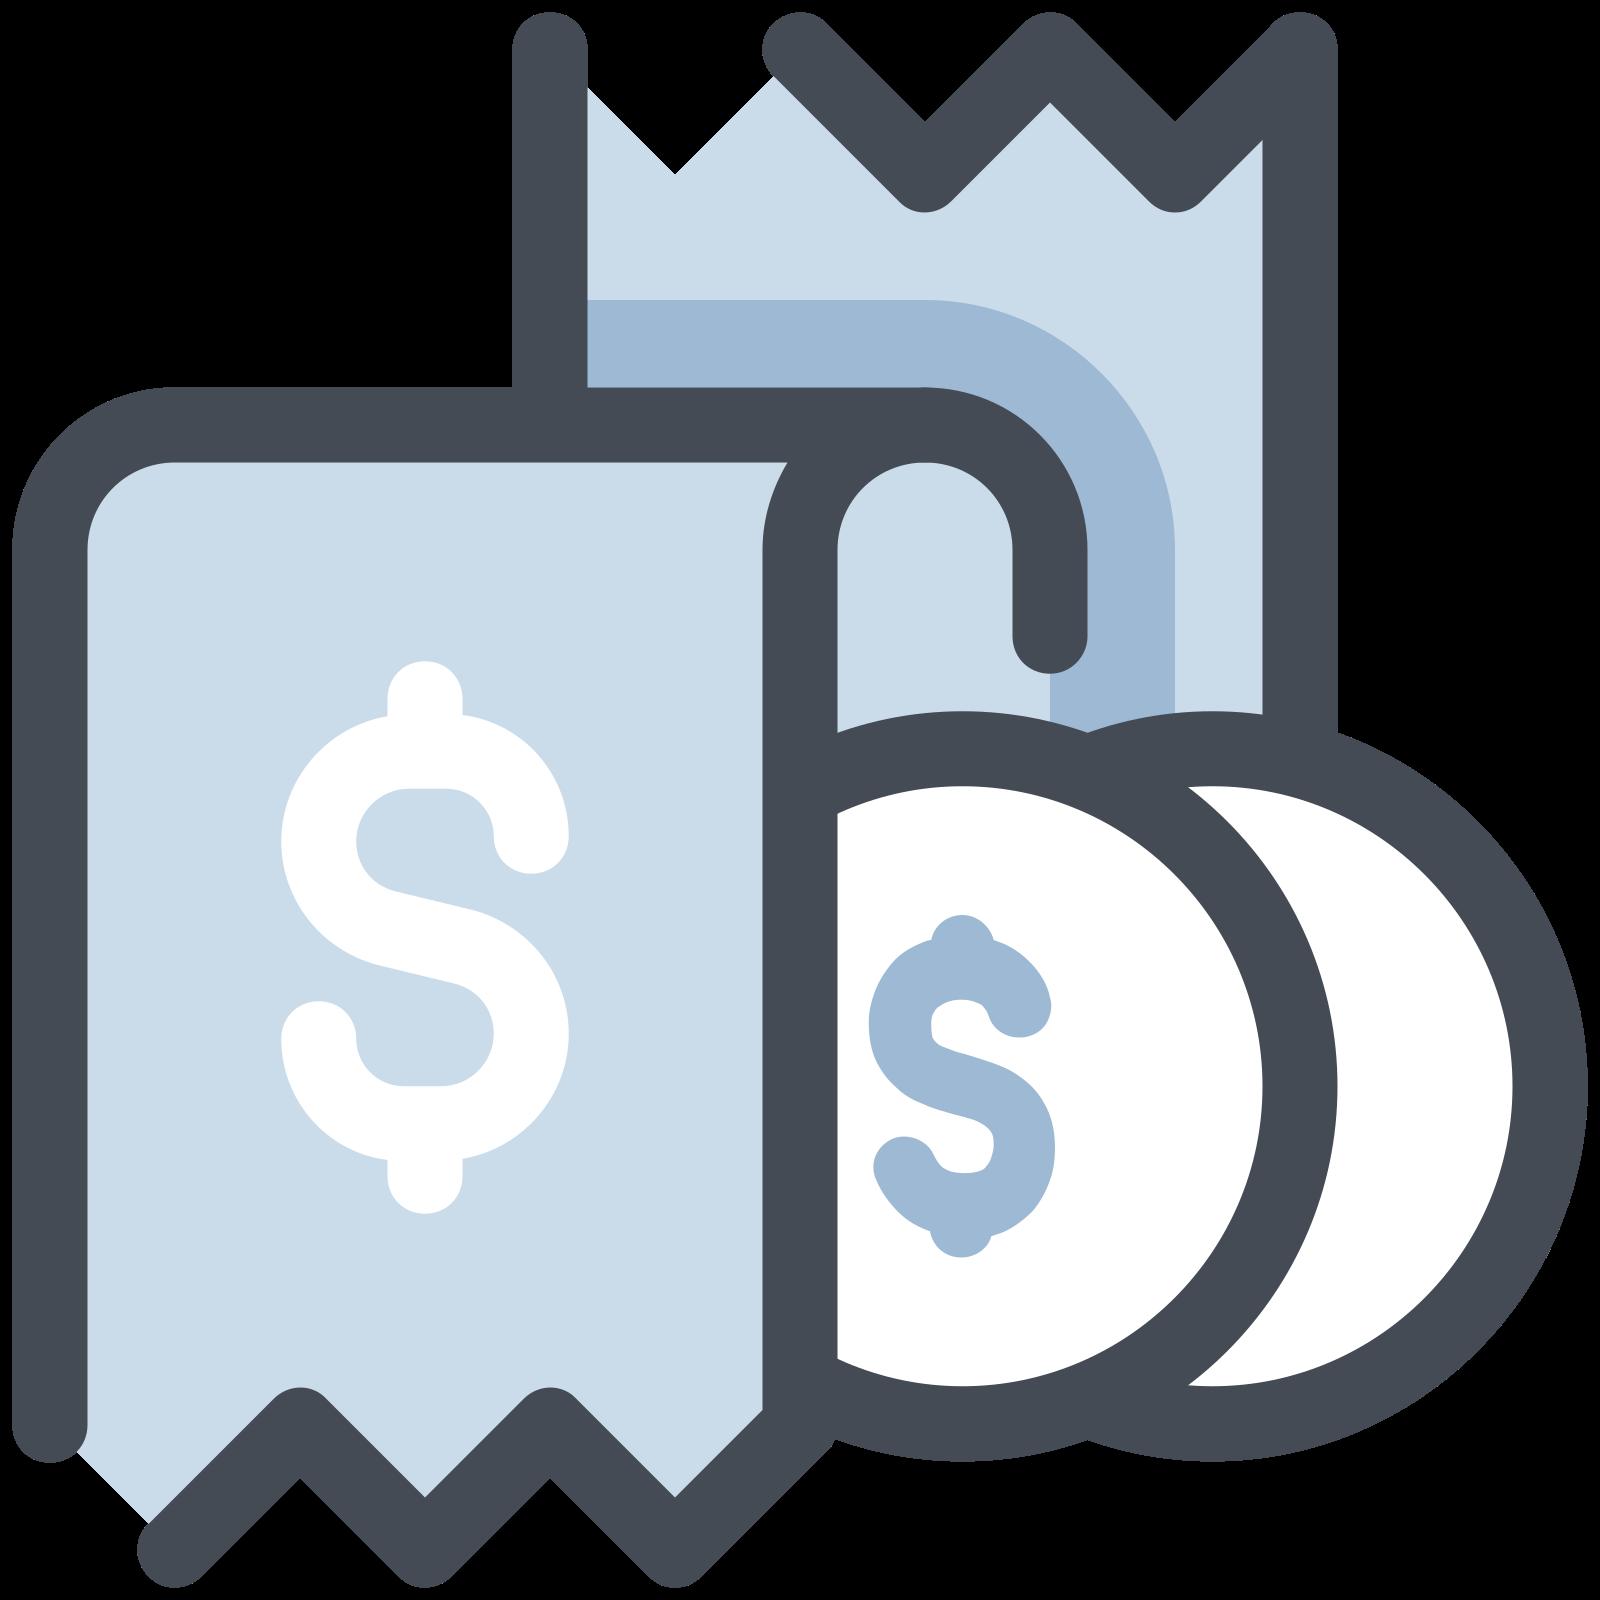 Kup za monety icon